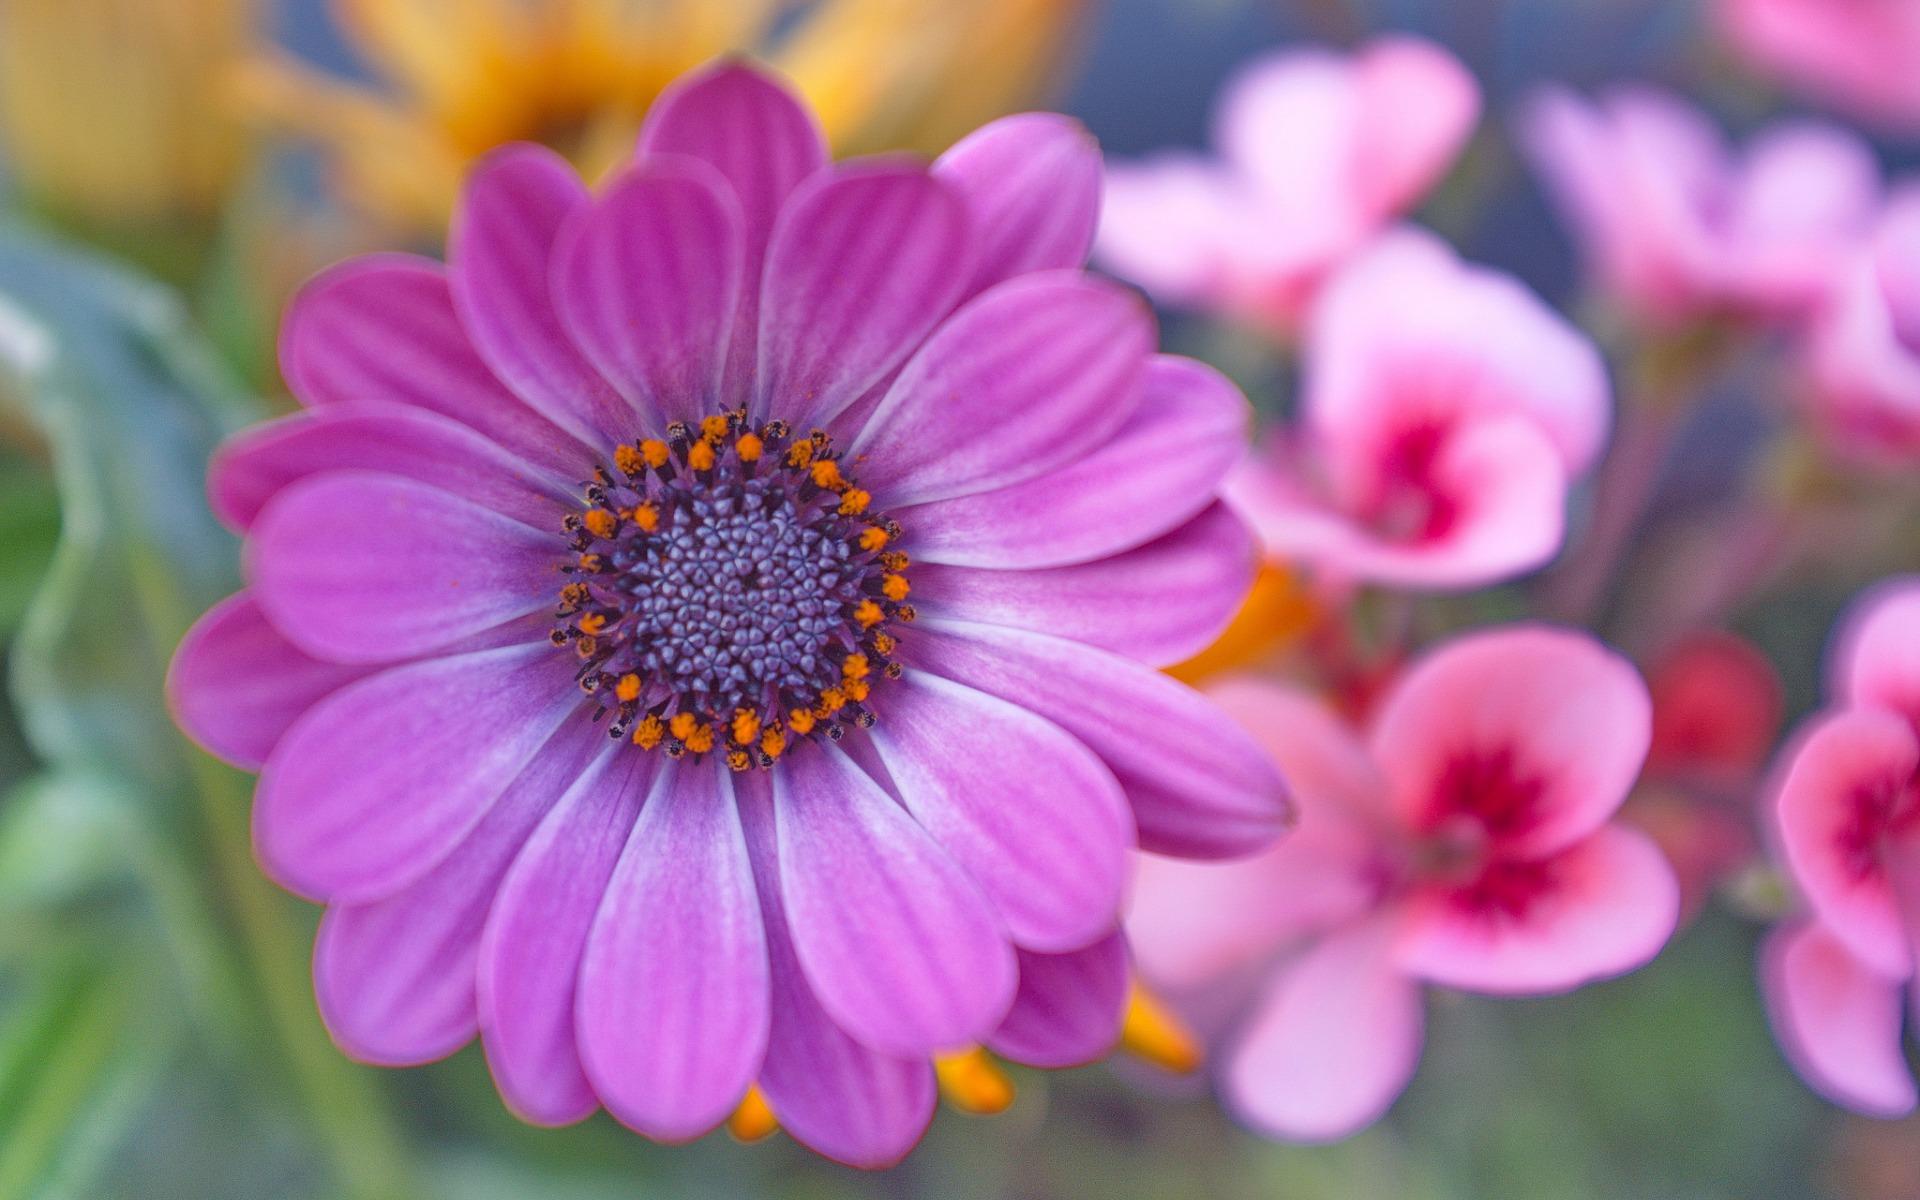 hinh anh hoa cuc dep 54